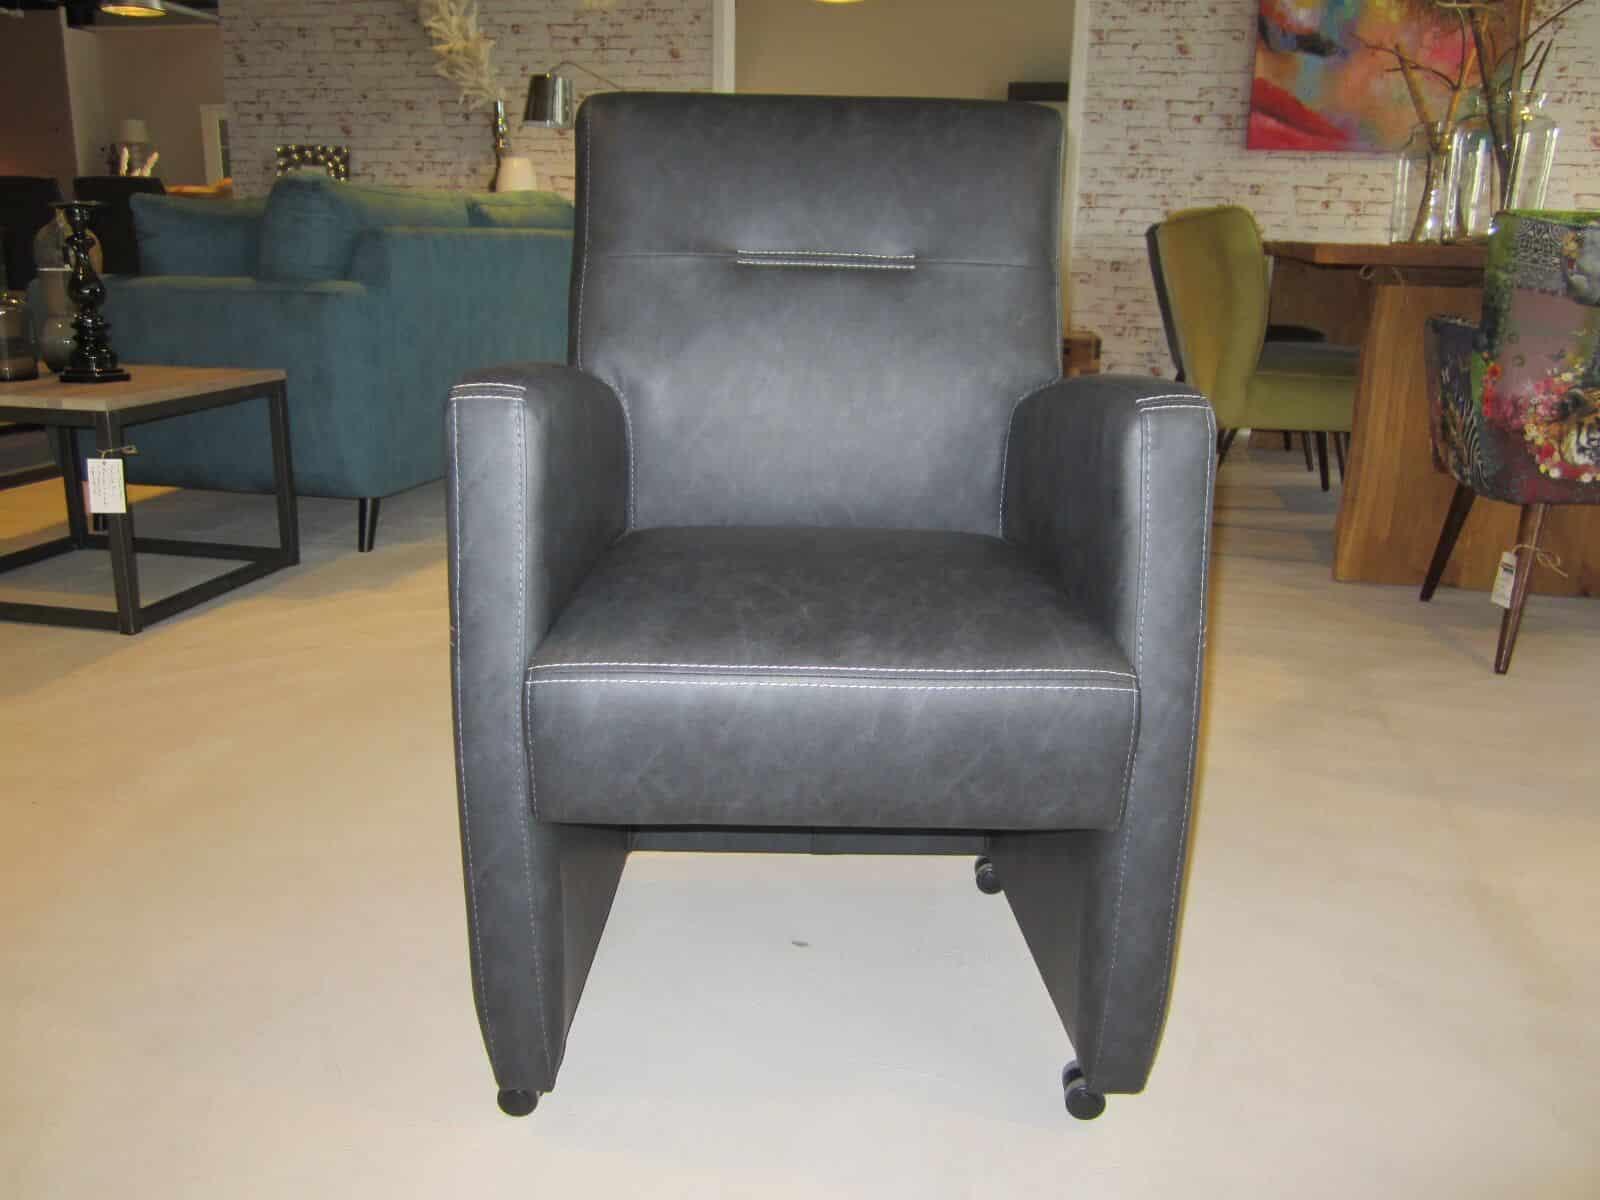 mit rollen archieven het ambacht losser woonwinkel. Black Bedroom Furniture Sets. Home Design Ideas